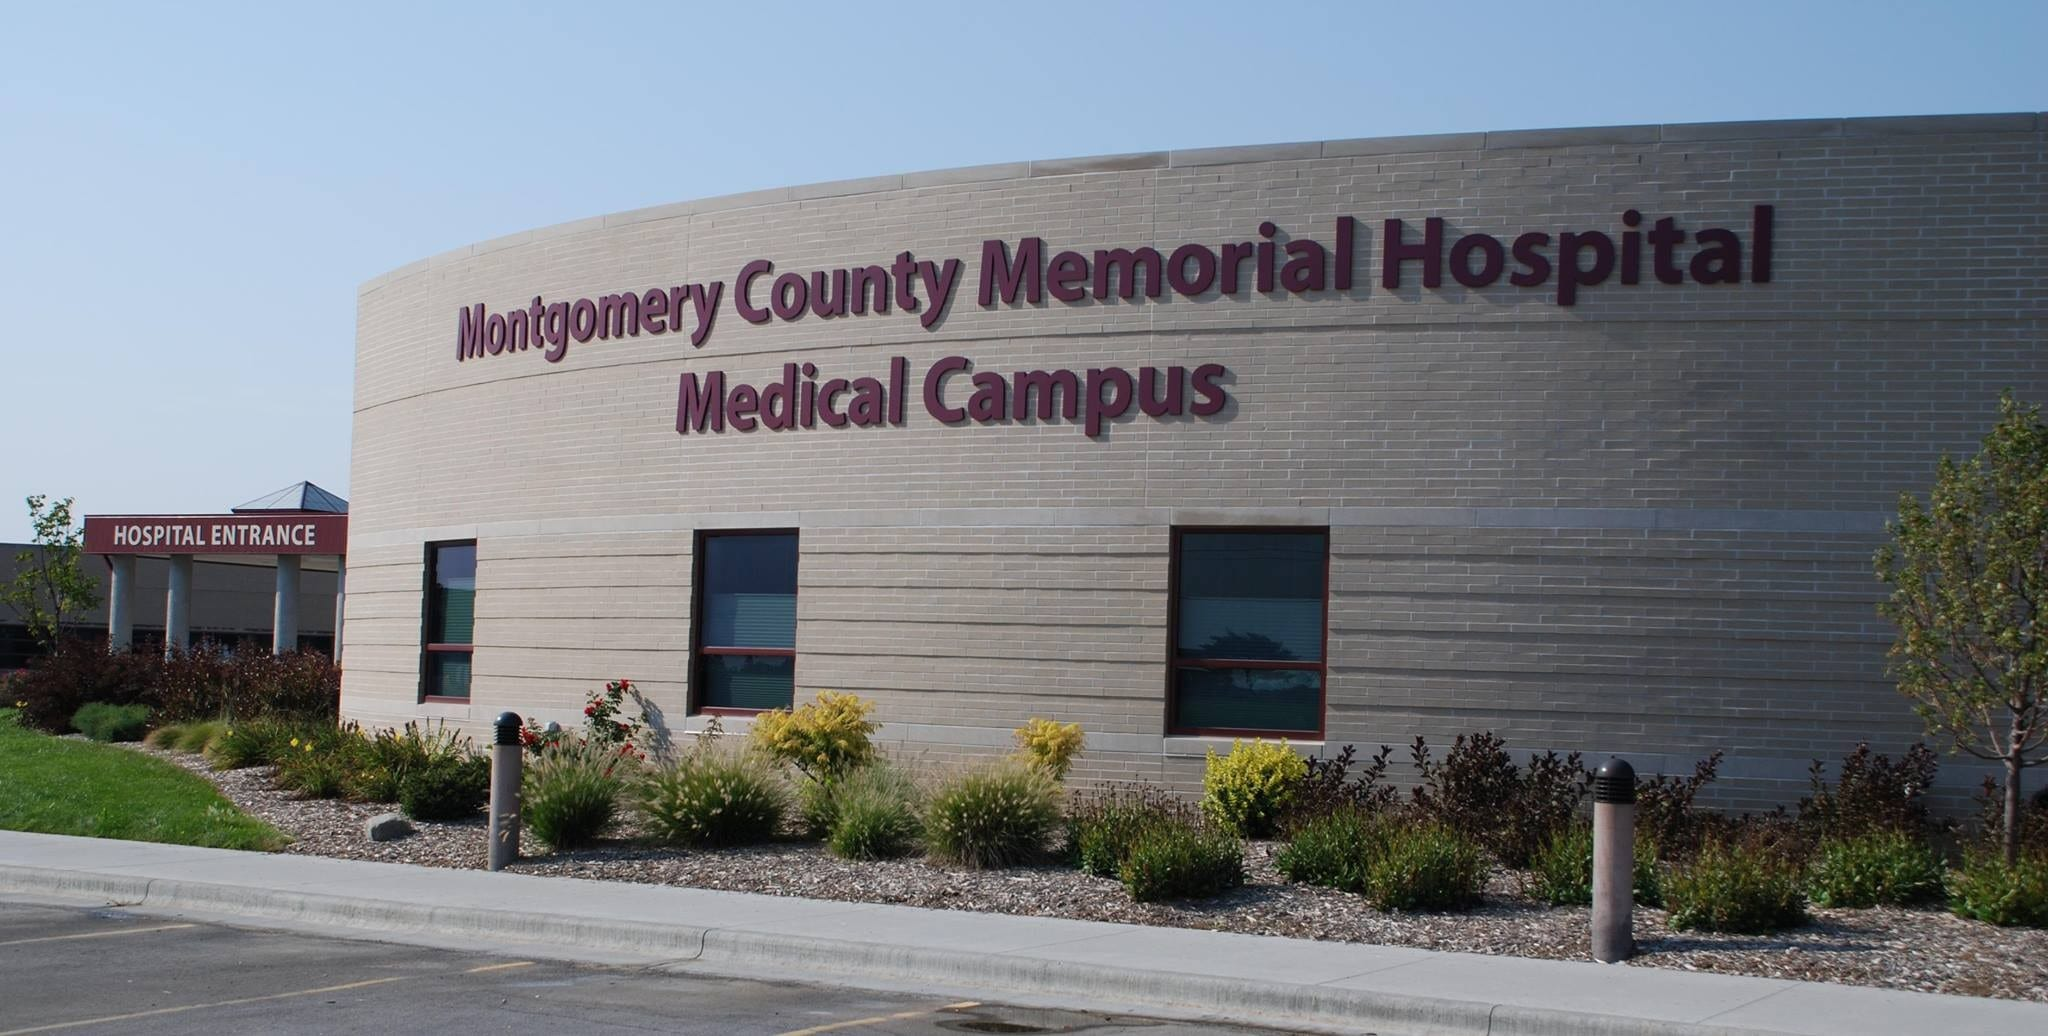 Montgomery County Memorial Hospital